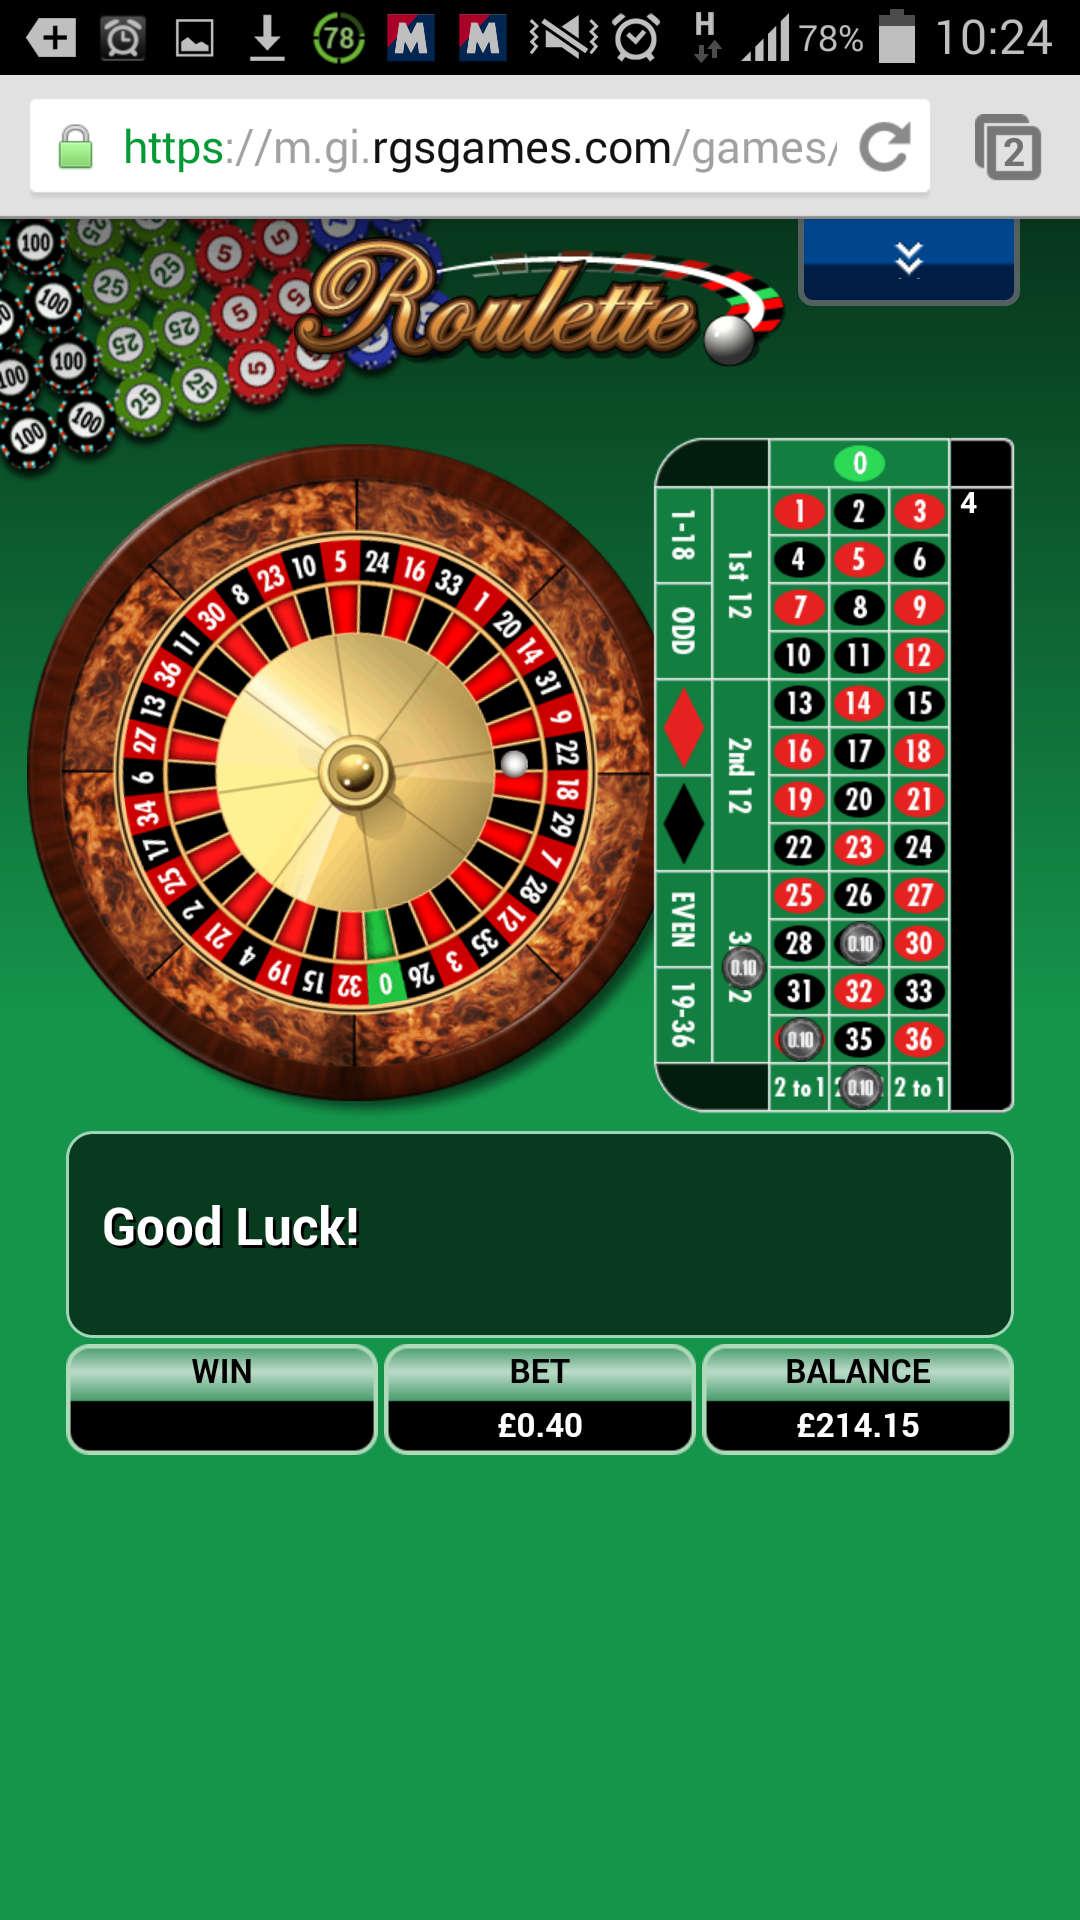 Internet high stakes gambling gambling granny family barn